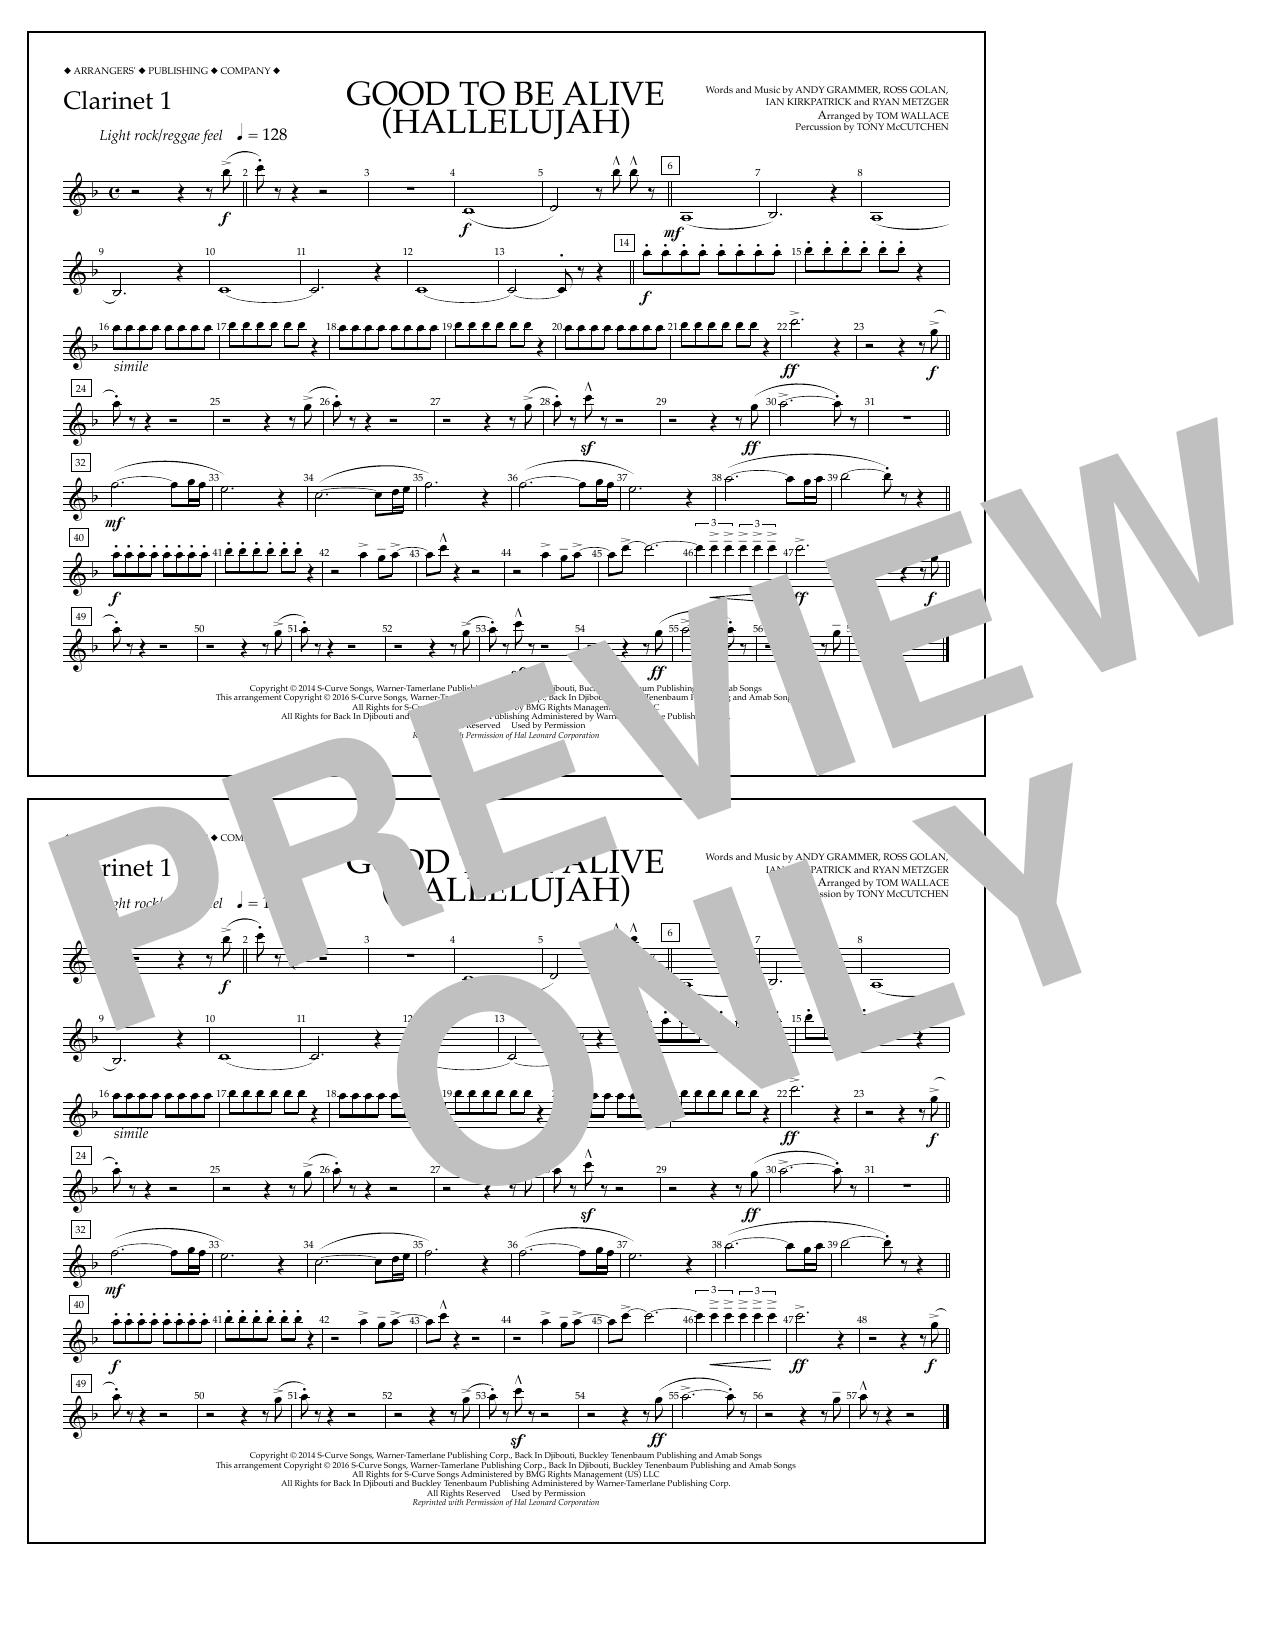 Good to Be Alive (Hallelujah) - Clarinet 1 Sheet Music